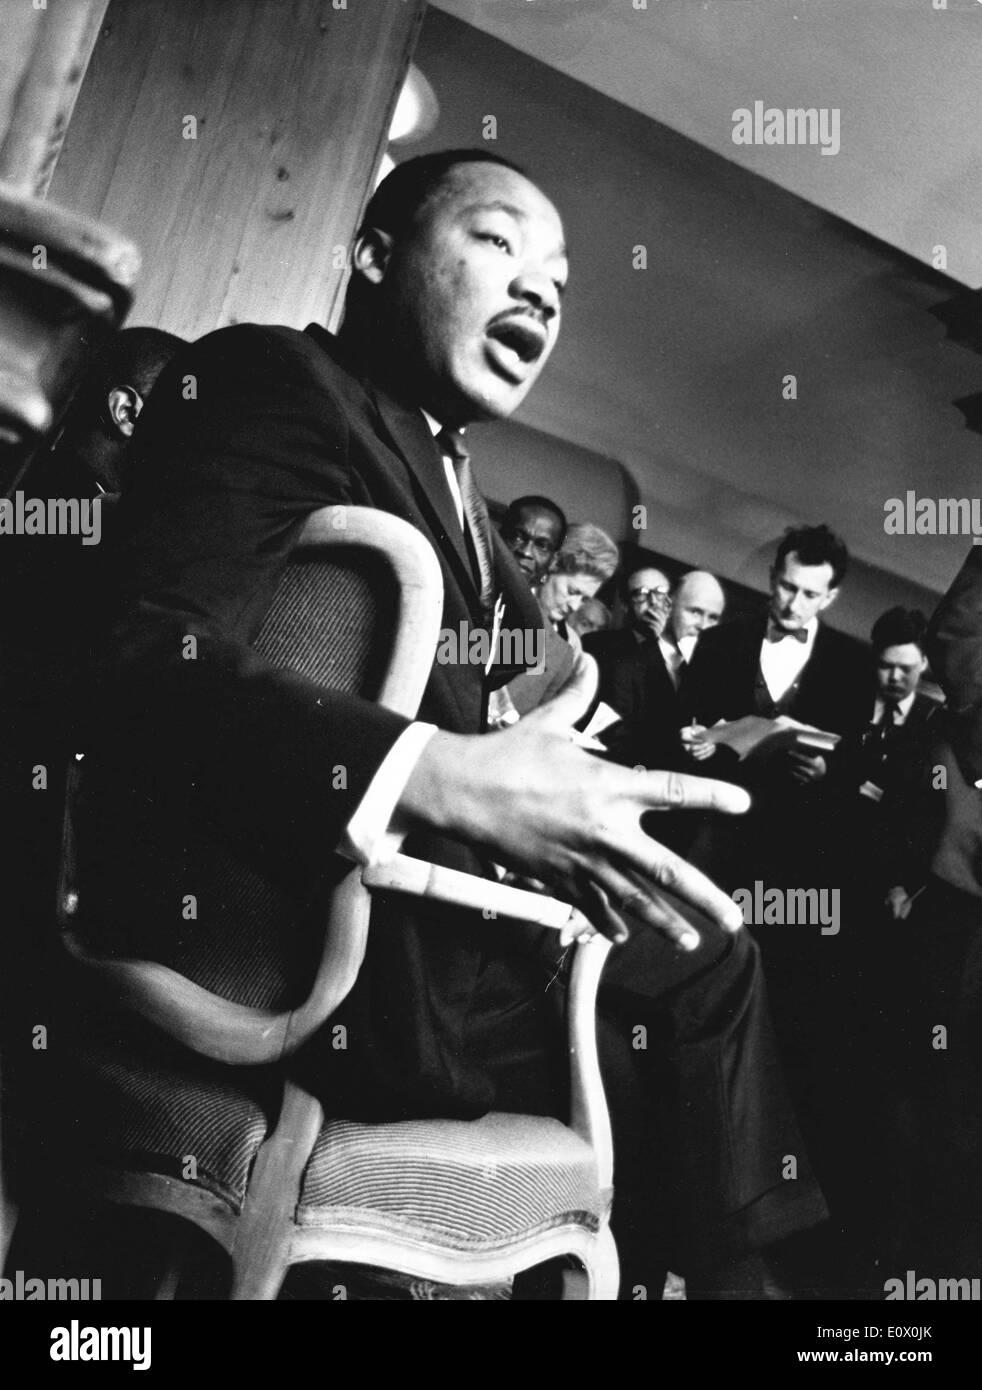 Martin Luther King Jr. in einem Stuhl Rede in London Stockfoto